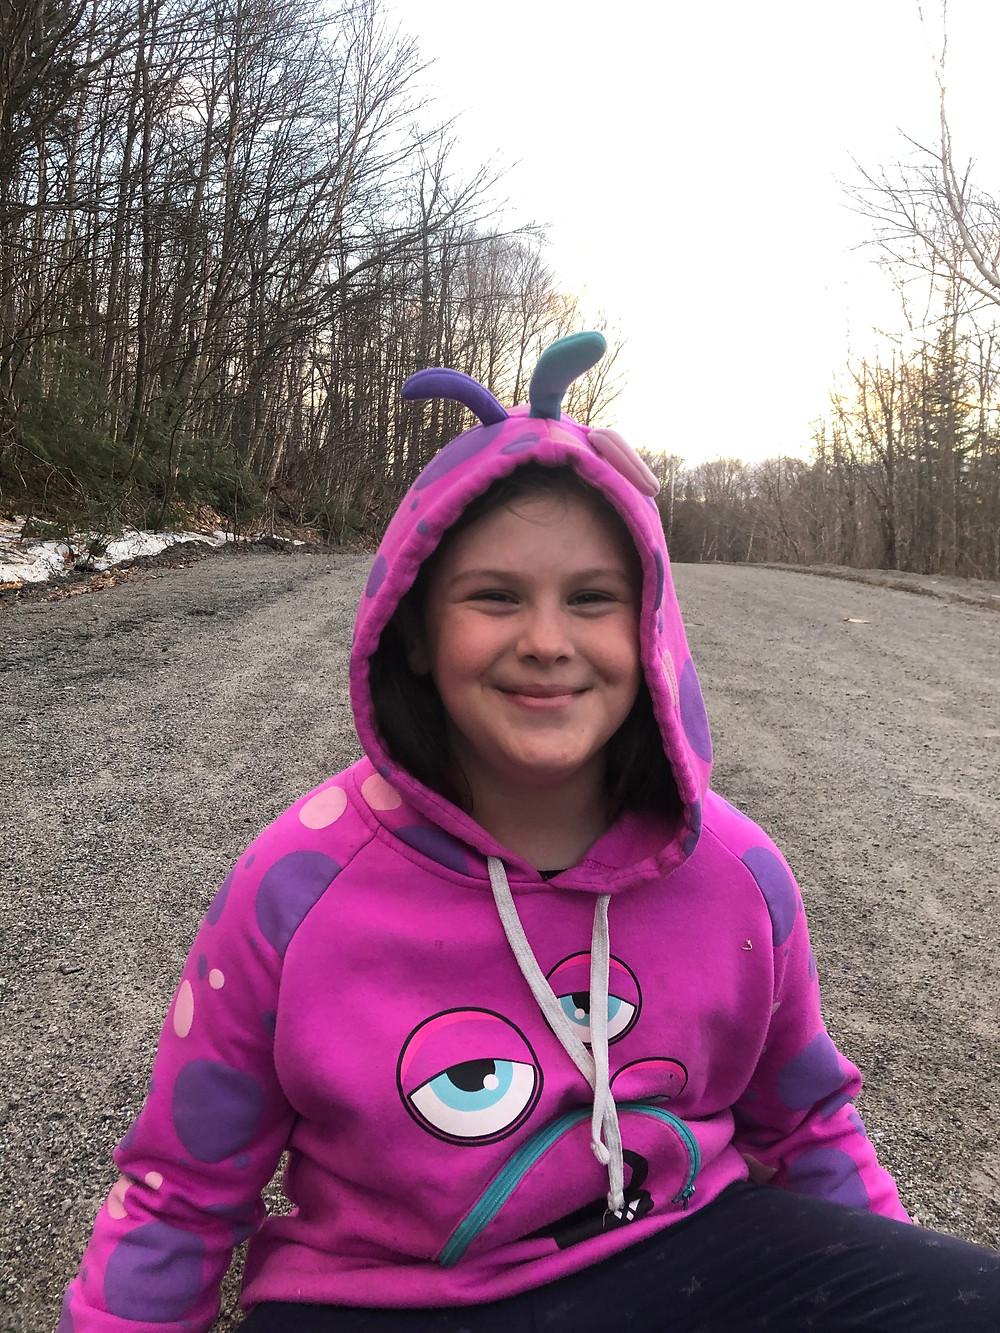 Ève Baribeault, 9 ans